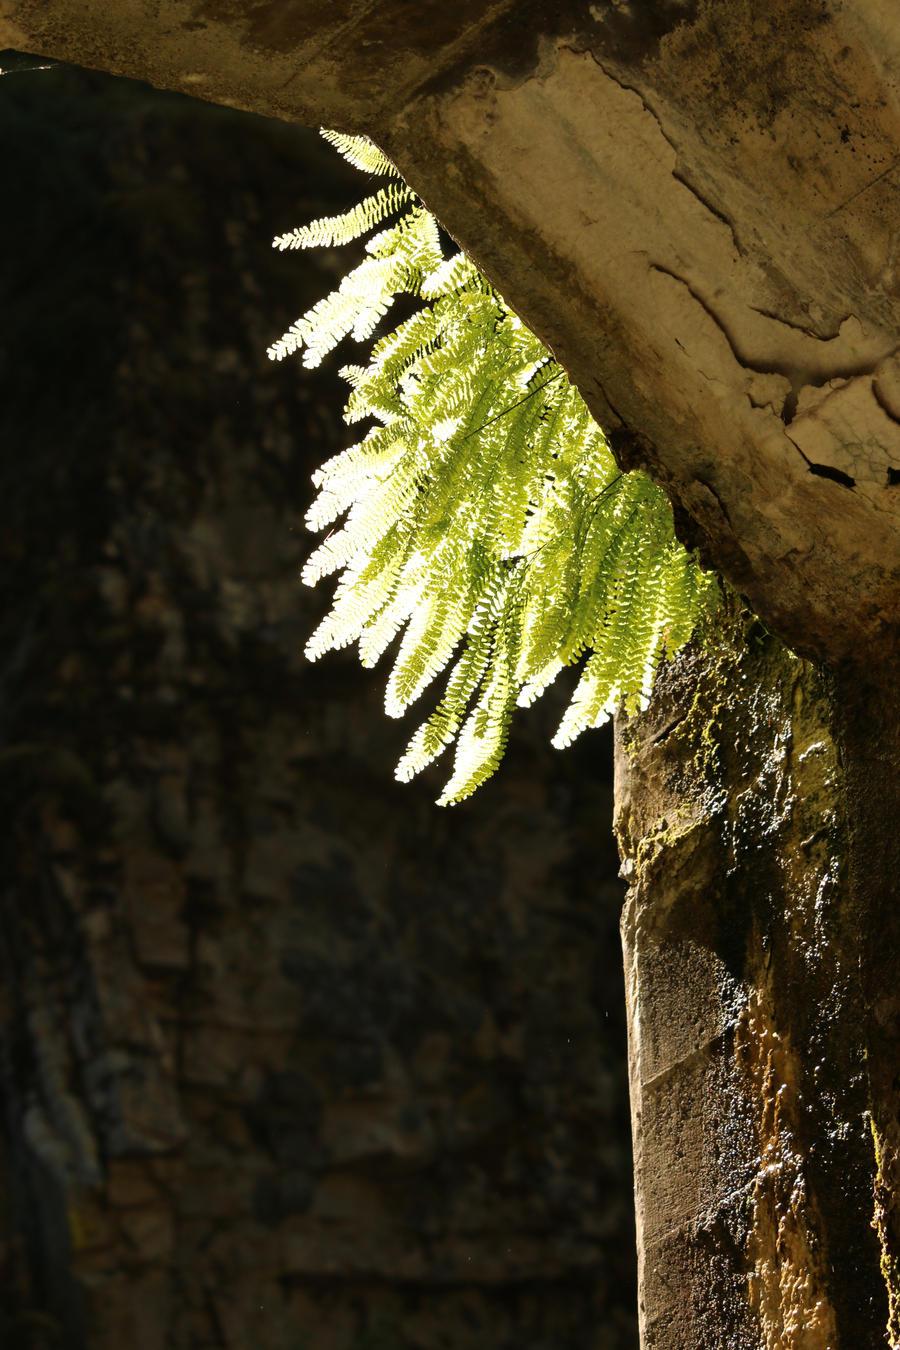 Backlit ferns by Meagharan